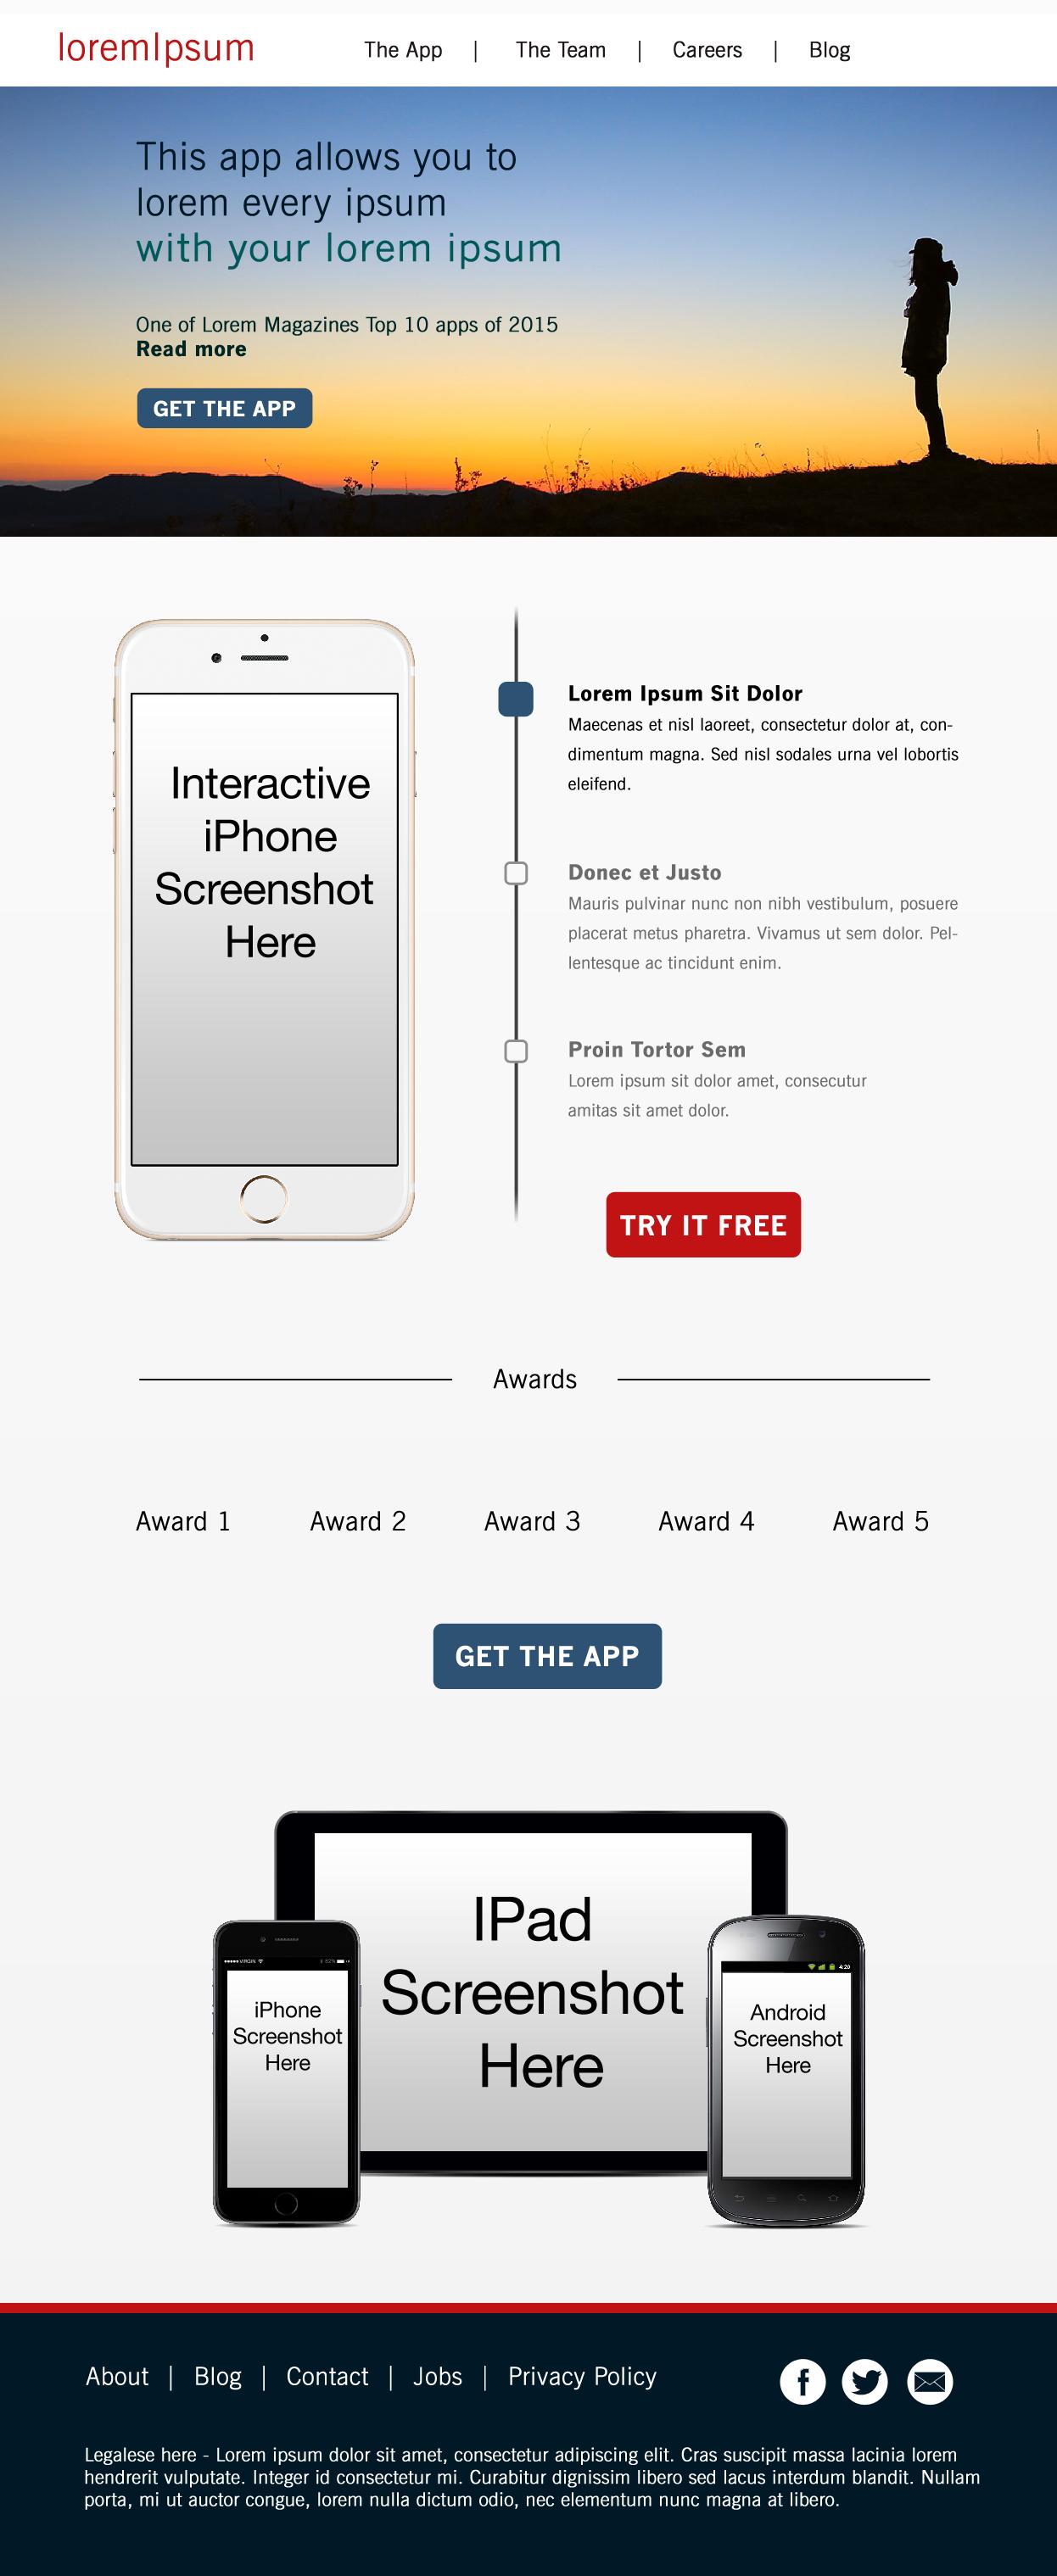 Desktop Landing Page for a Mobile App by Jonathan Maas - Top Photo Courtesy of Lee Scott via Unsplash.com